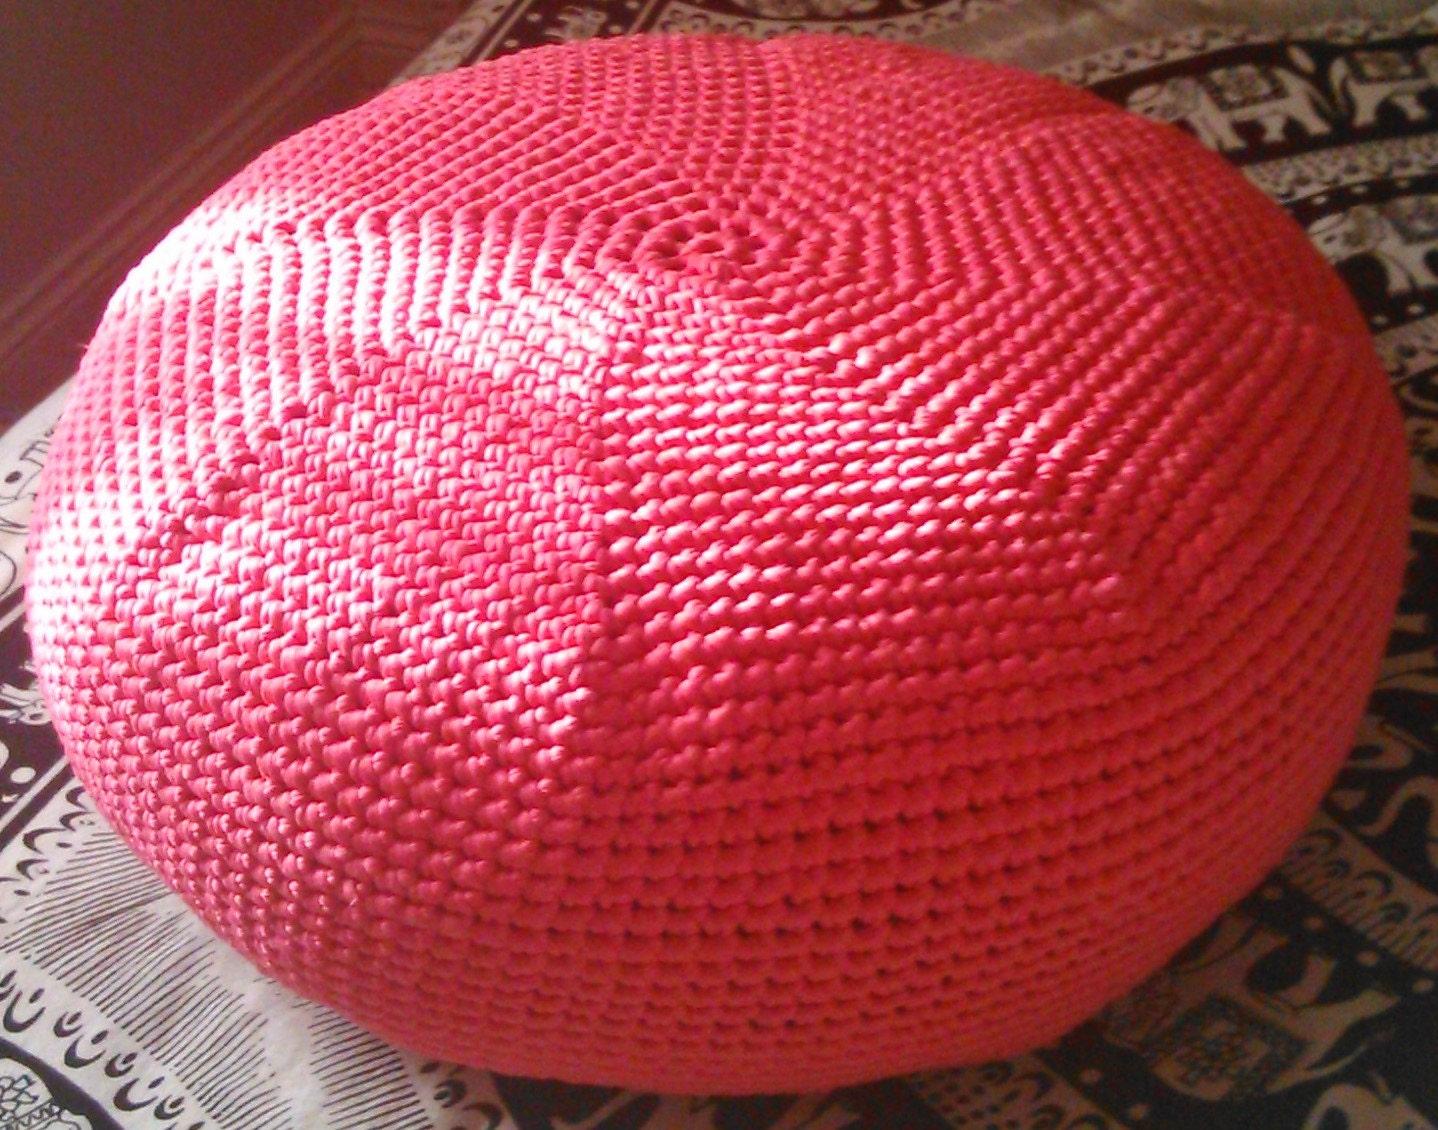 Knitted crochet pouf pouffe pink ottoman footstool in deep hot - Knitted pouf ottoman pattern ...